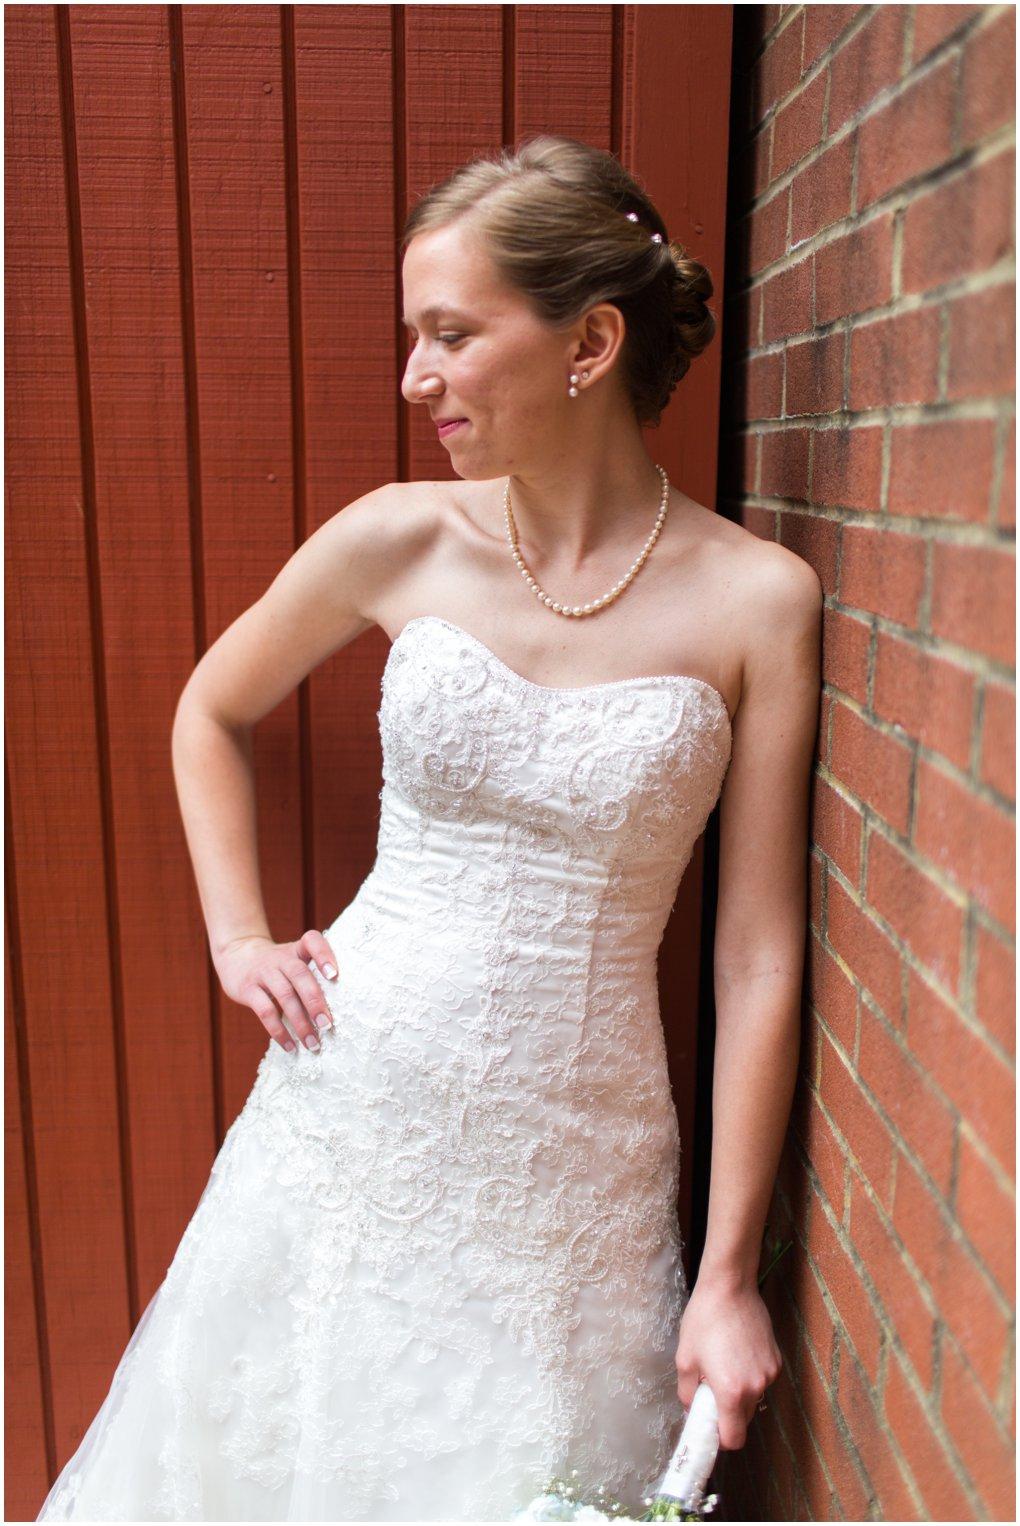 hudgins-wedding-2013-205.jpg